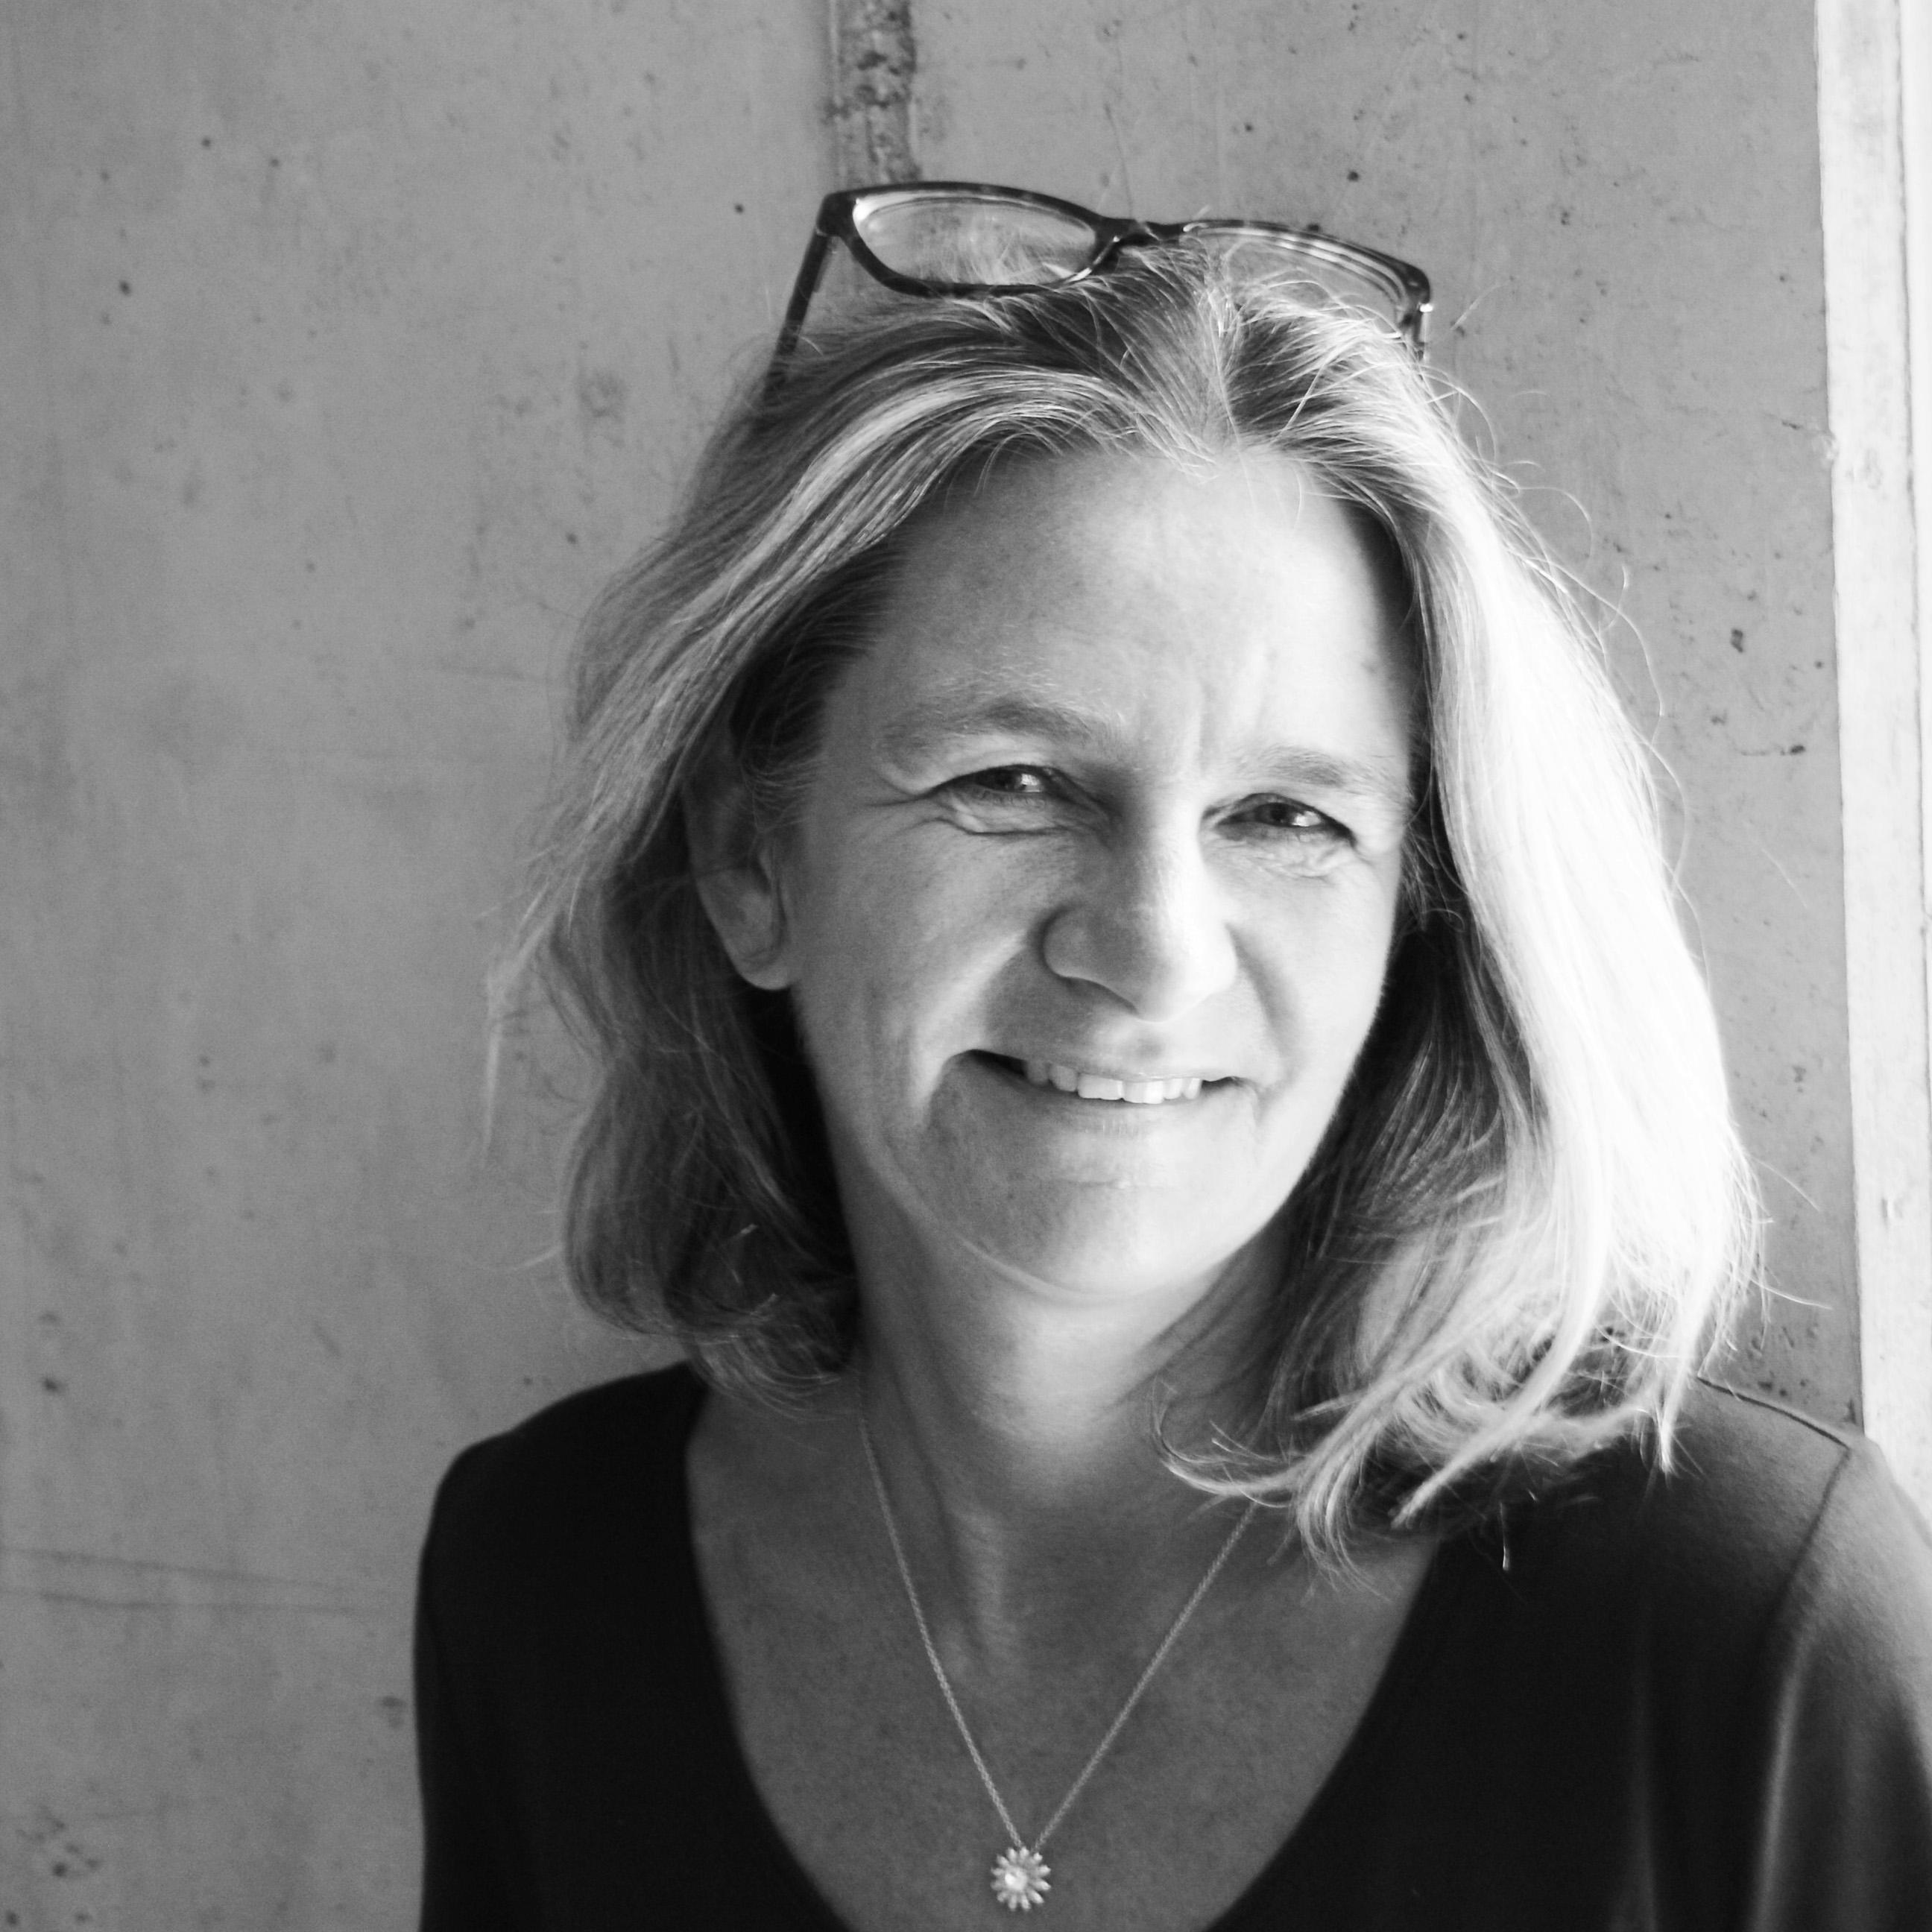 Sabine Haspel